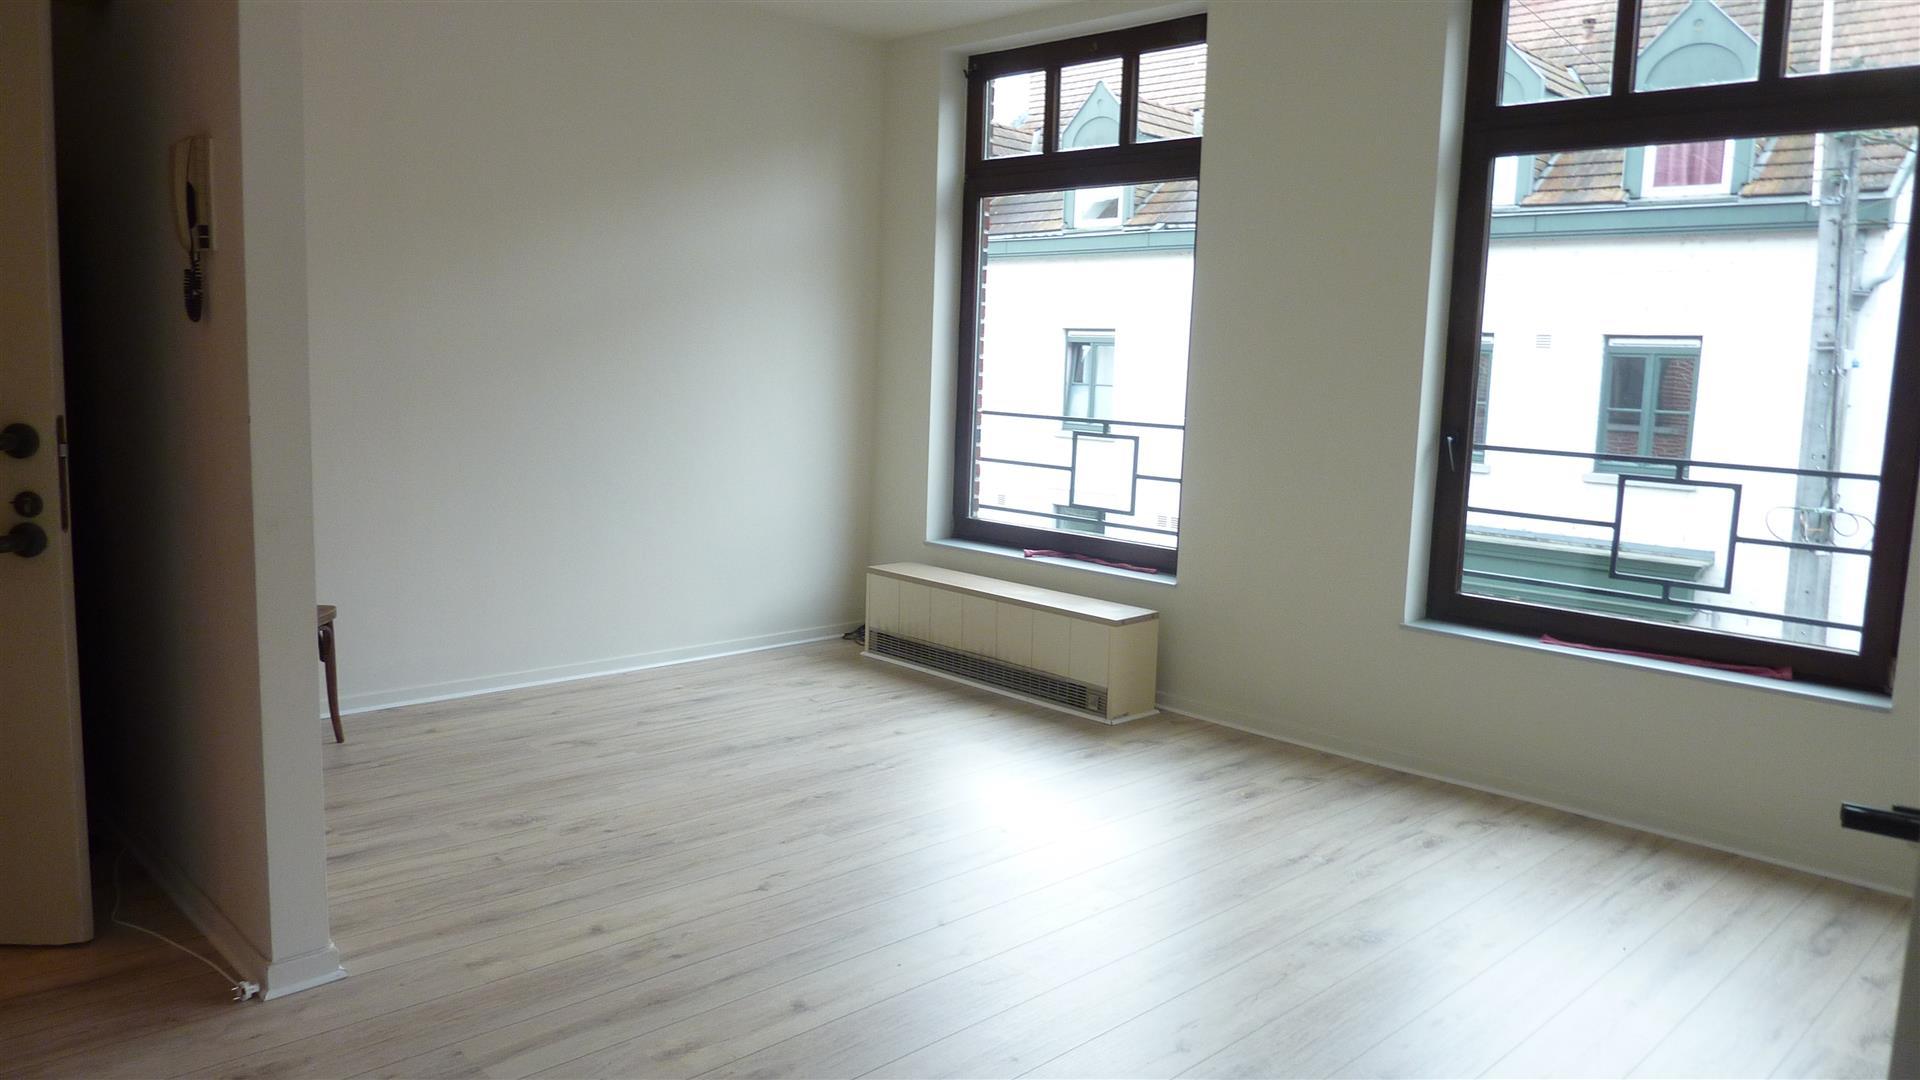 Appartement 2 chambres immobili re devill for Chambre immobiliere